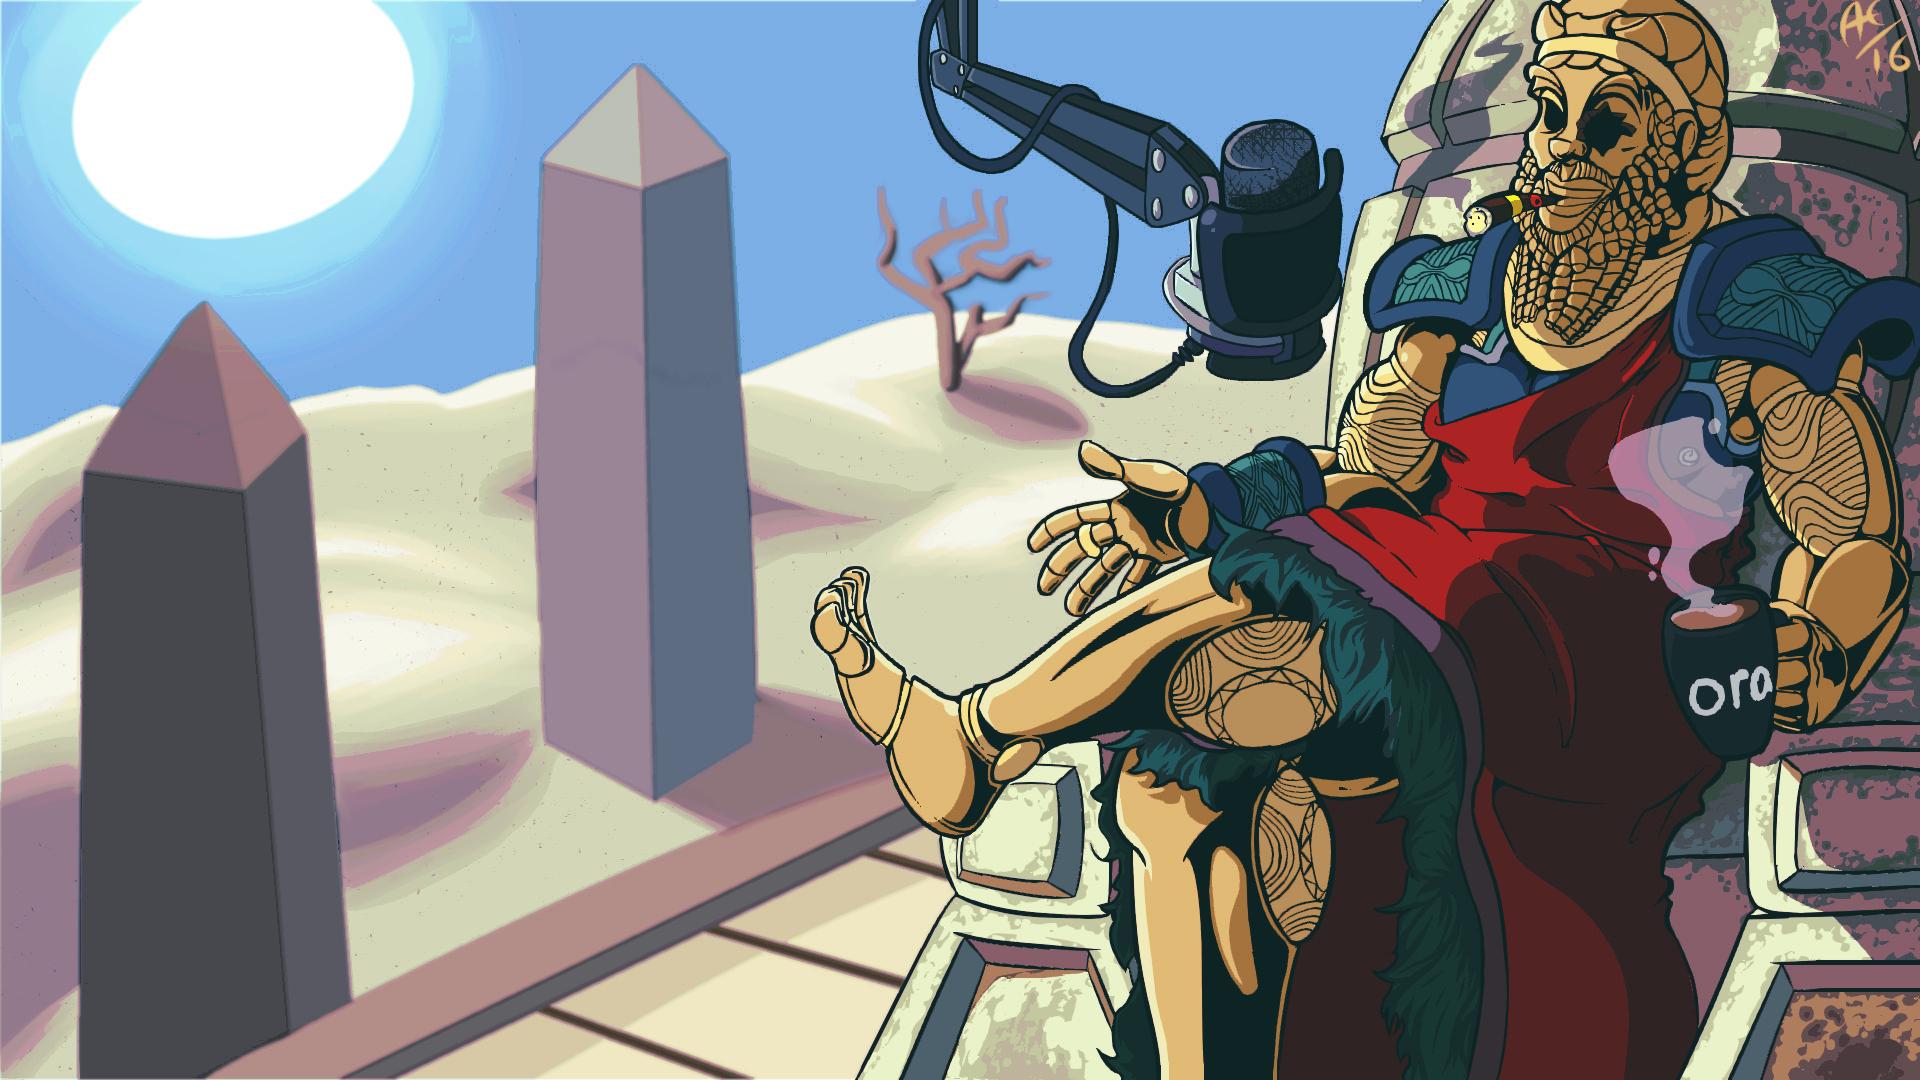 Sargon of Akkad Ora.TV competition piece